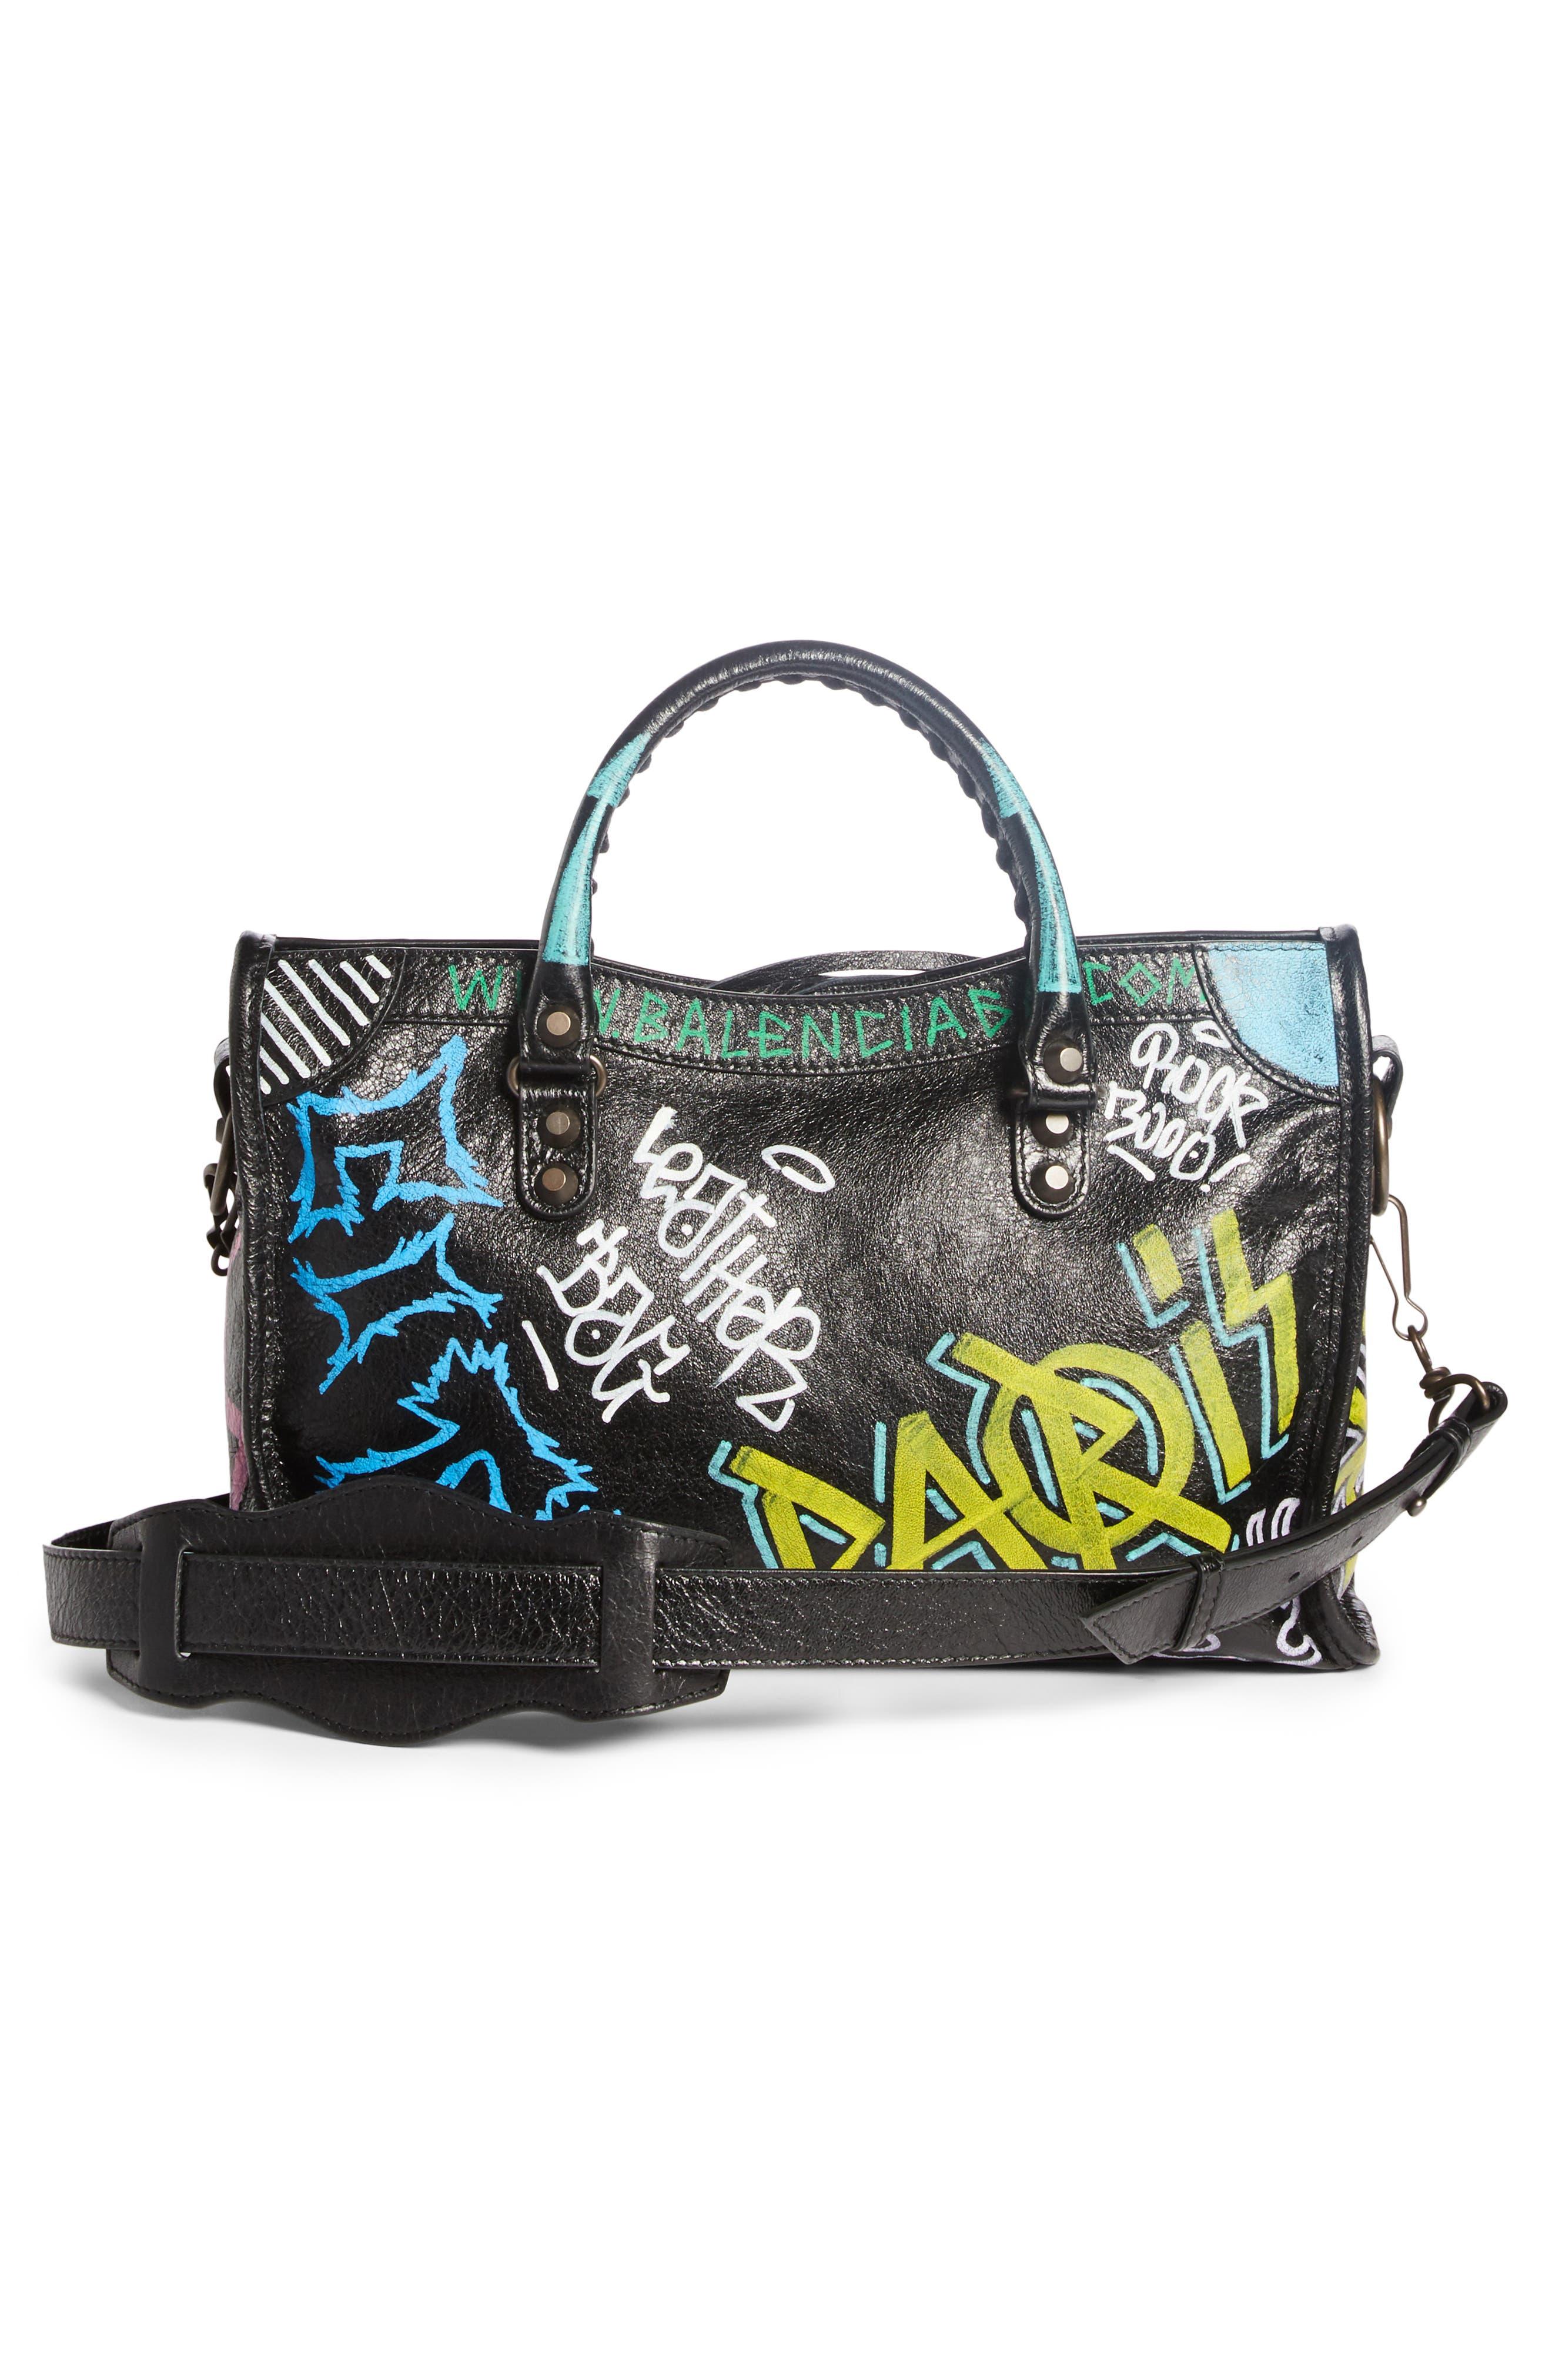 Small City Graffiti Leather Tote,                             Alternate thumbnail 3, color,                             NOIR MULTI